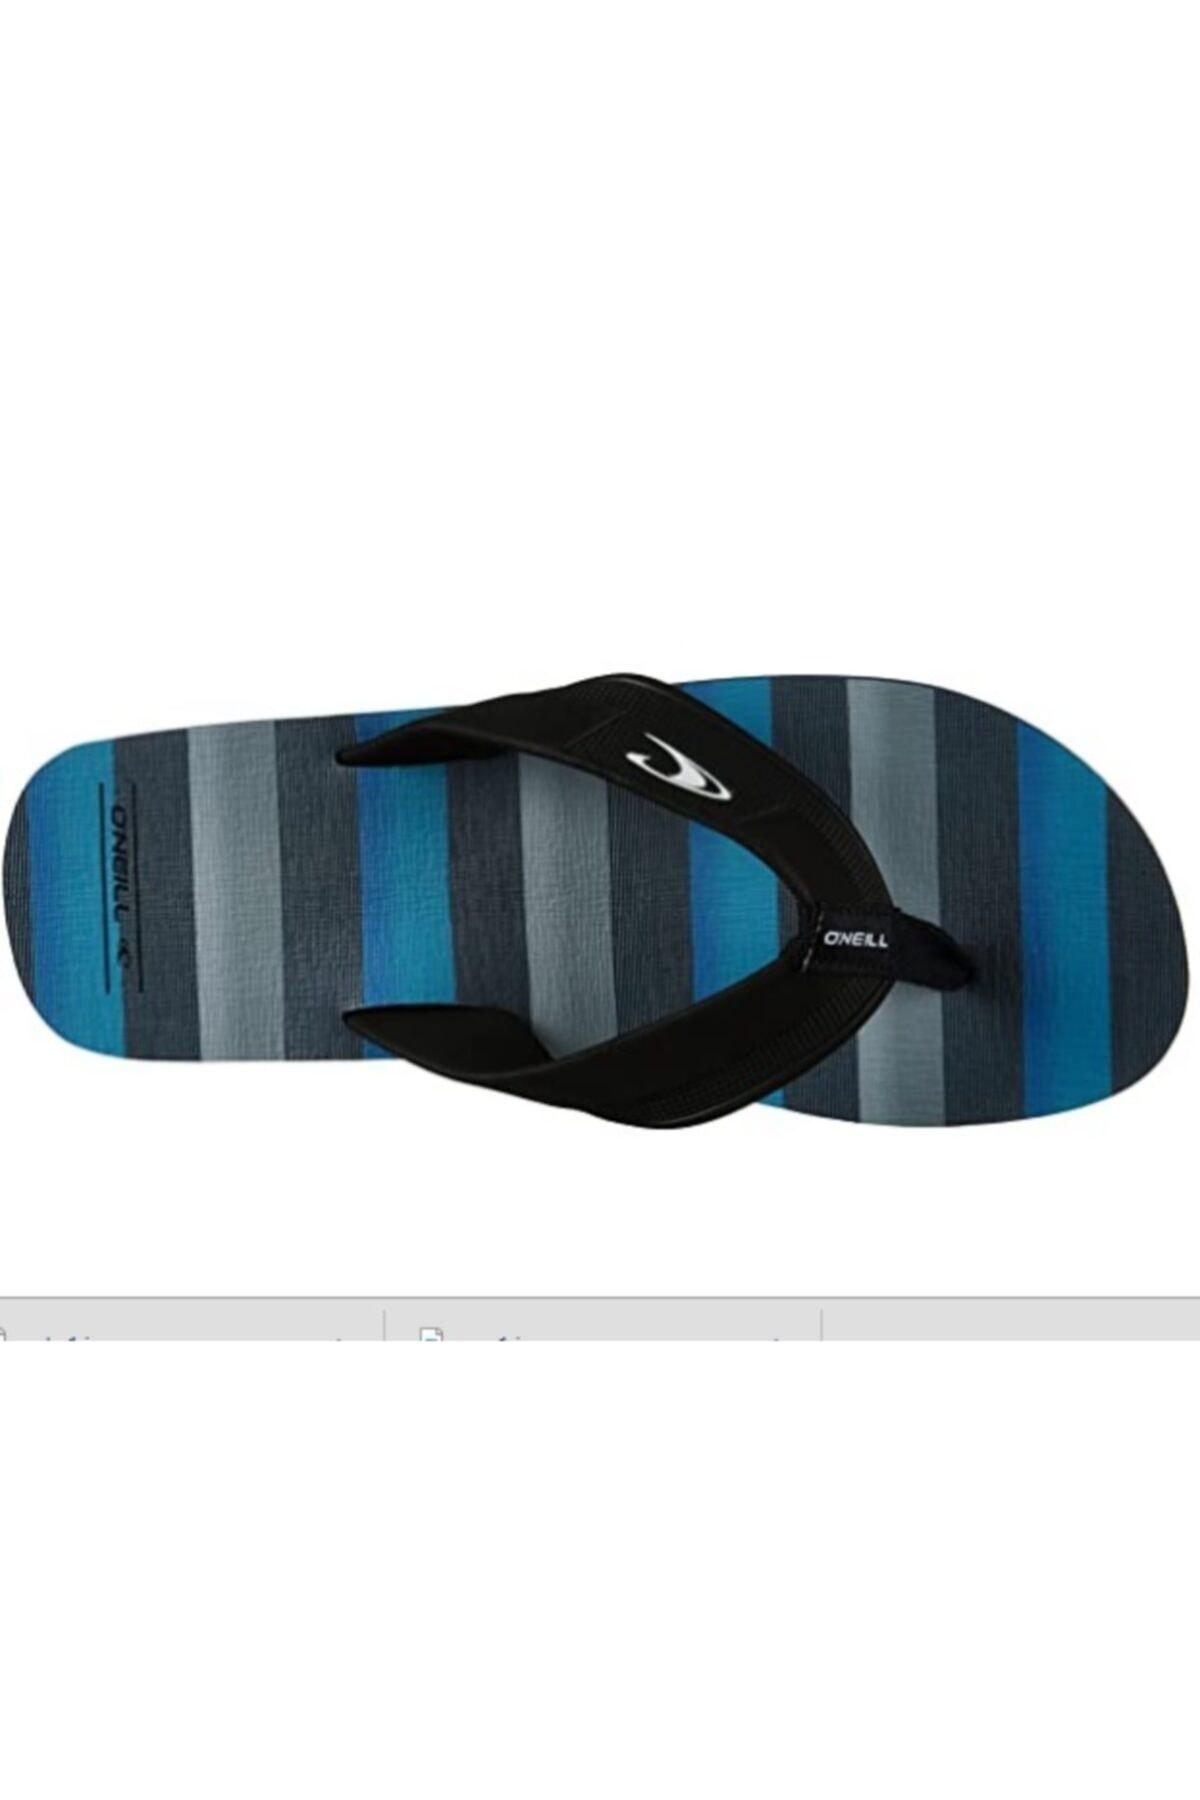 O'Neill Fm Imprint Santa Cruz Flip Flop Blue Aop,black 7a4524 2